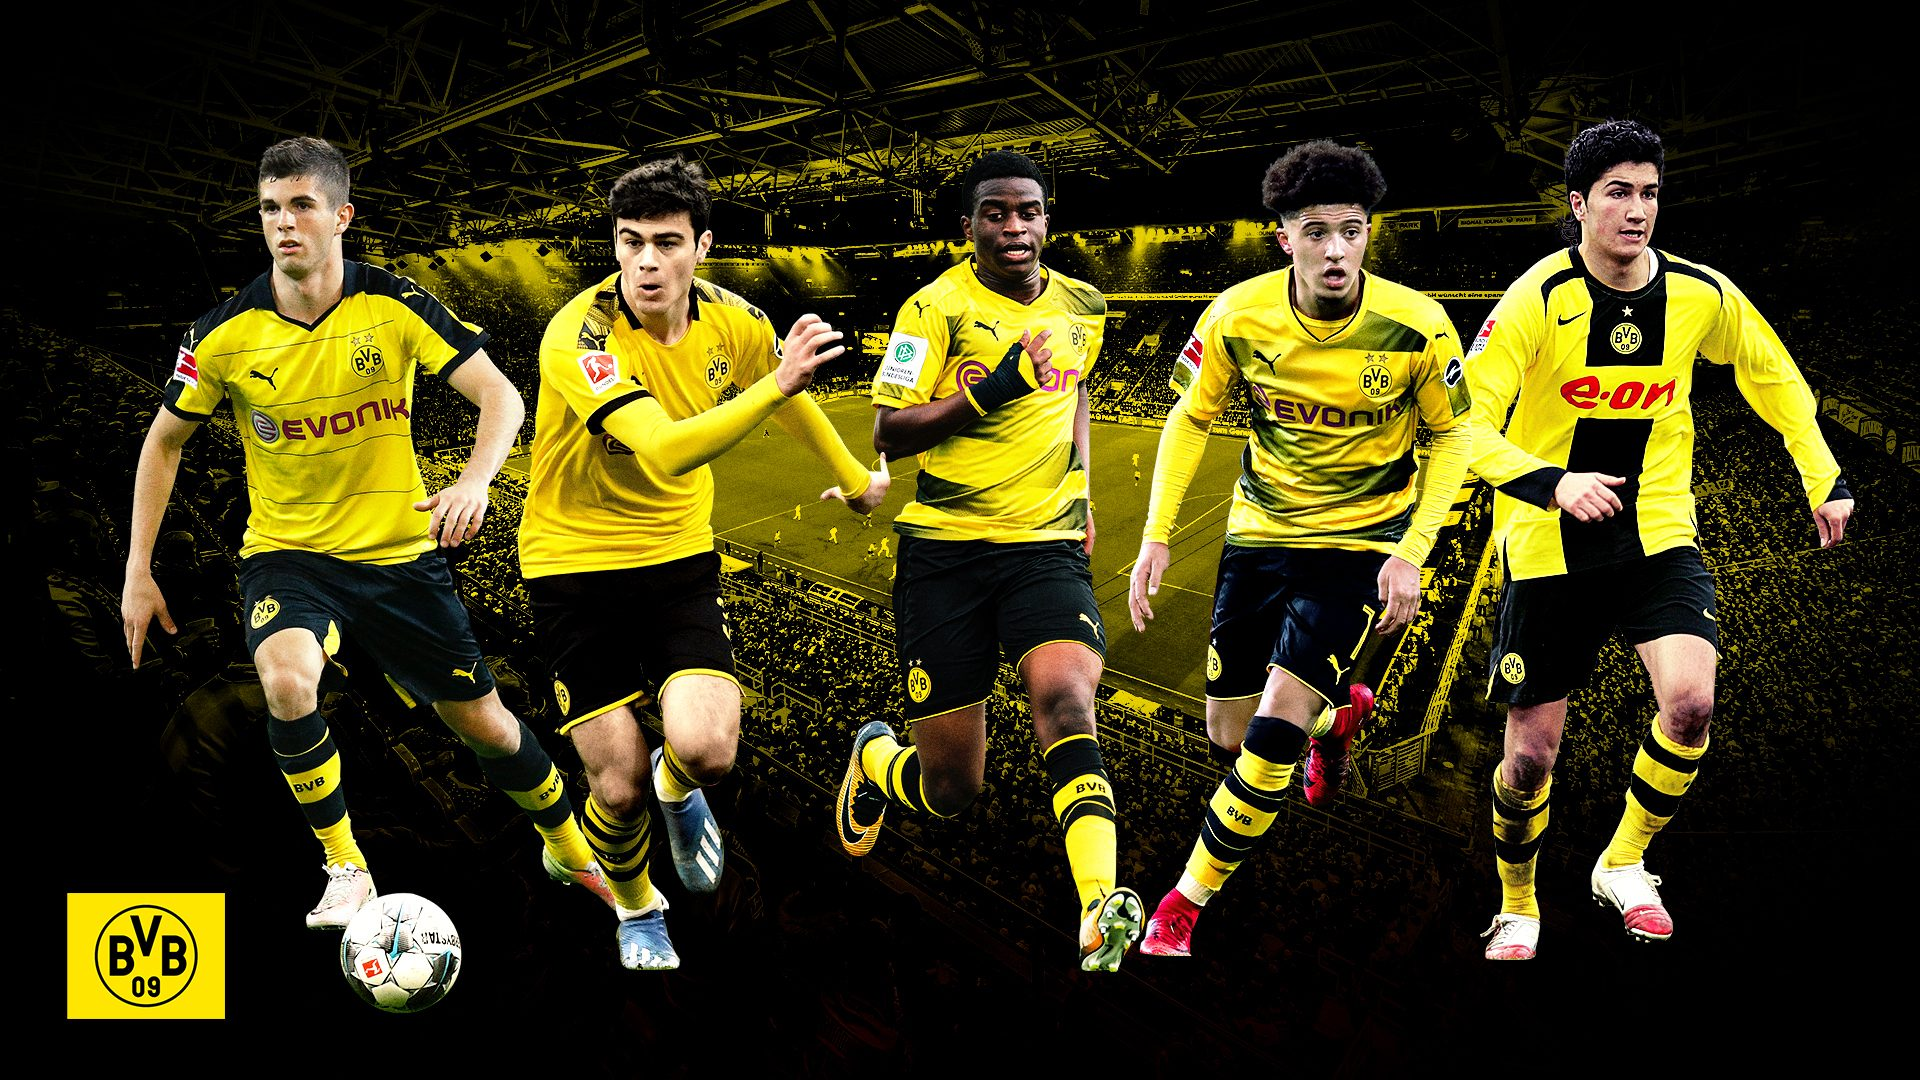 Bundesliga Borussia Dortmund S 10 Youngest Debutants Sahin Reyna And One Day Moukoko